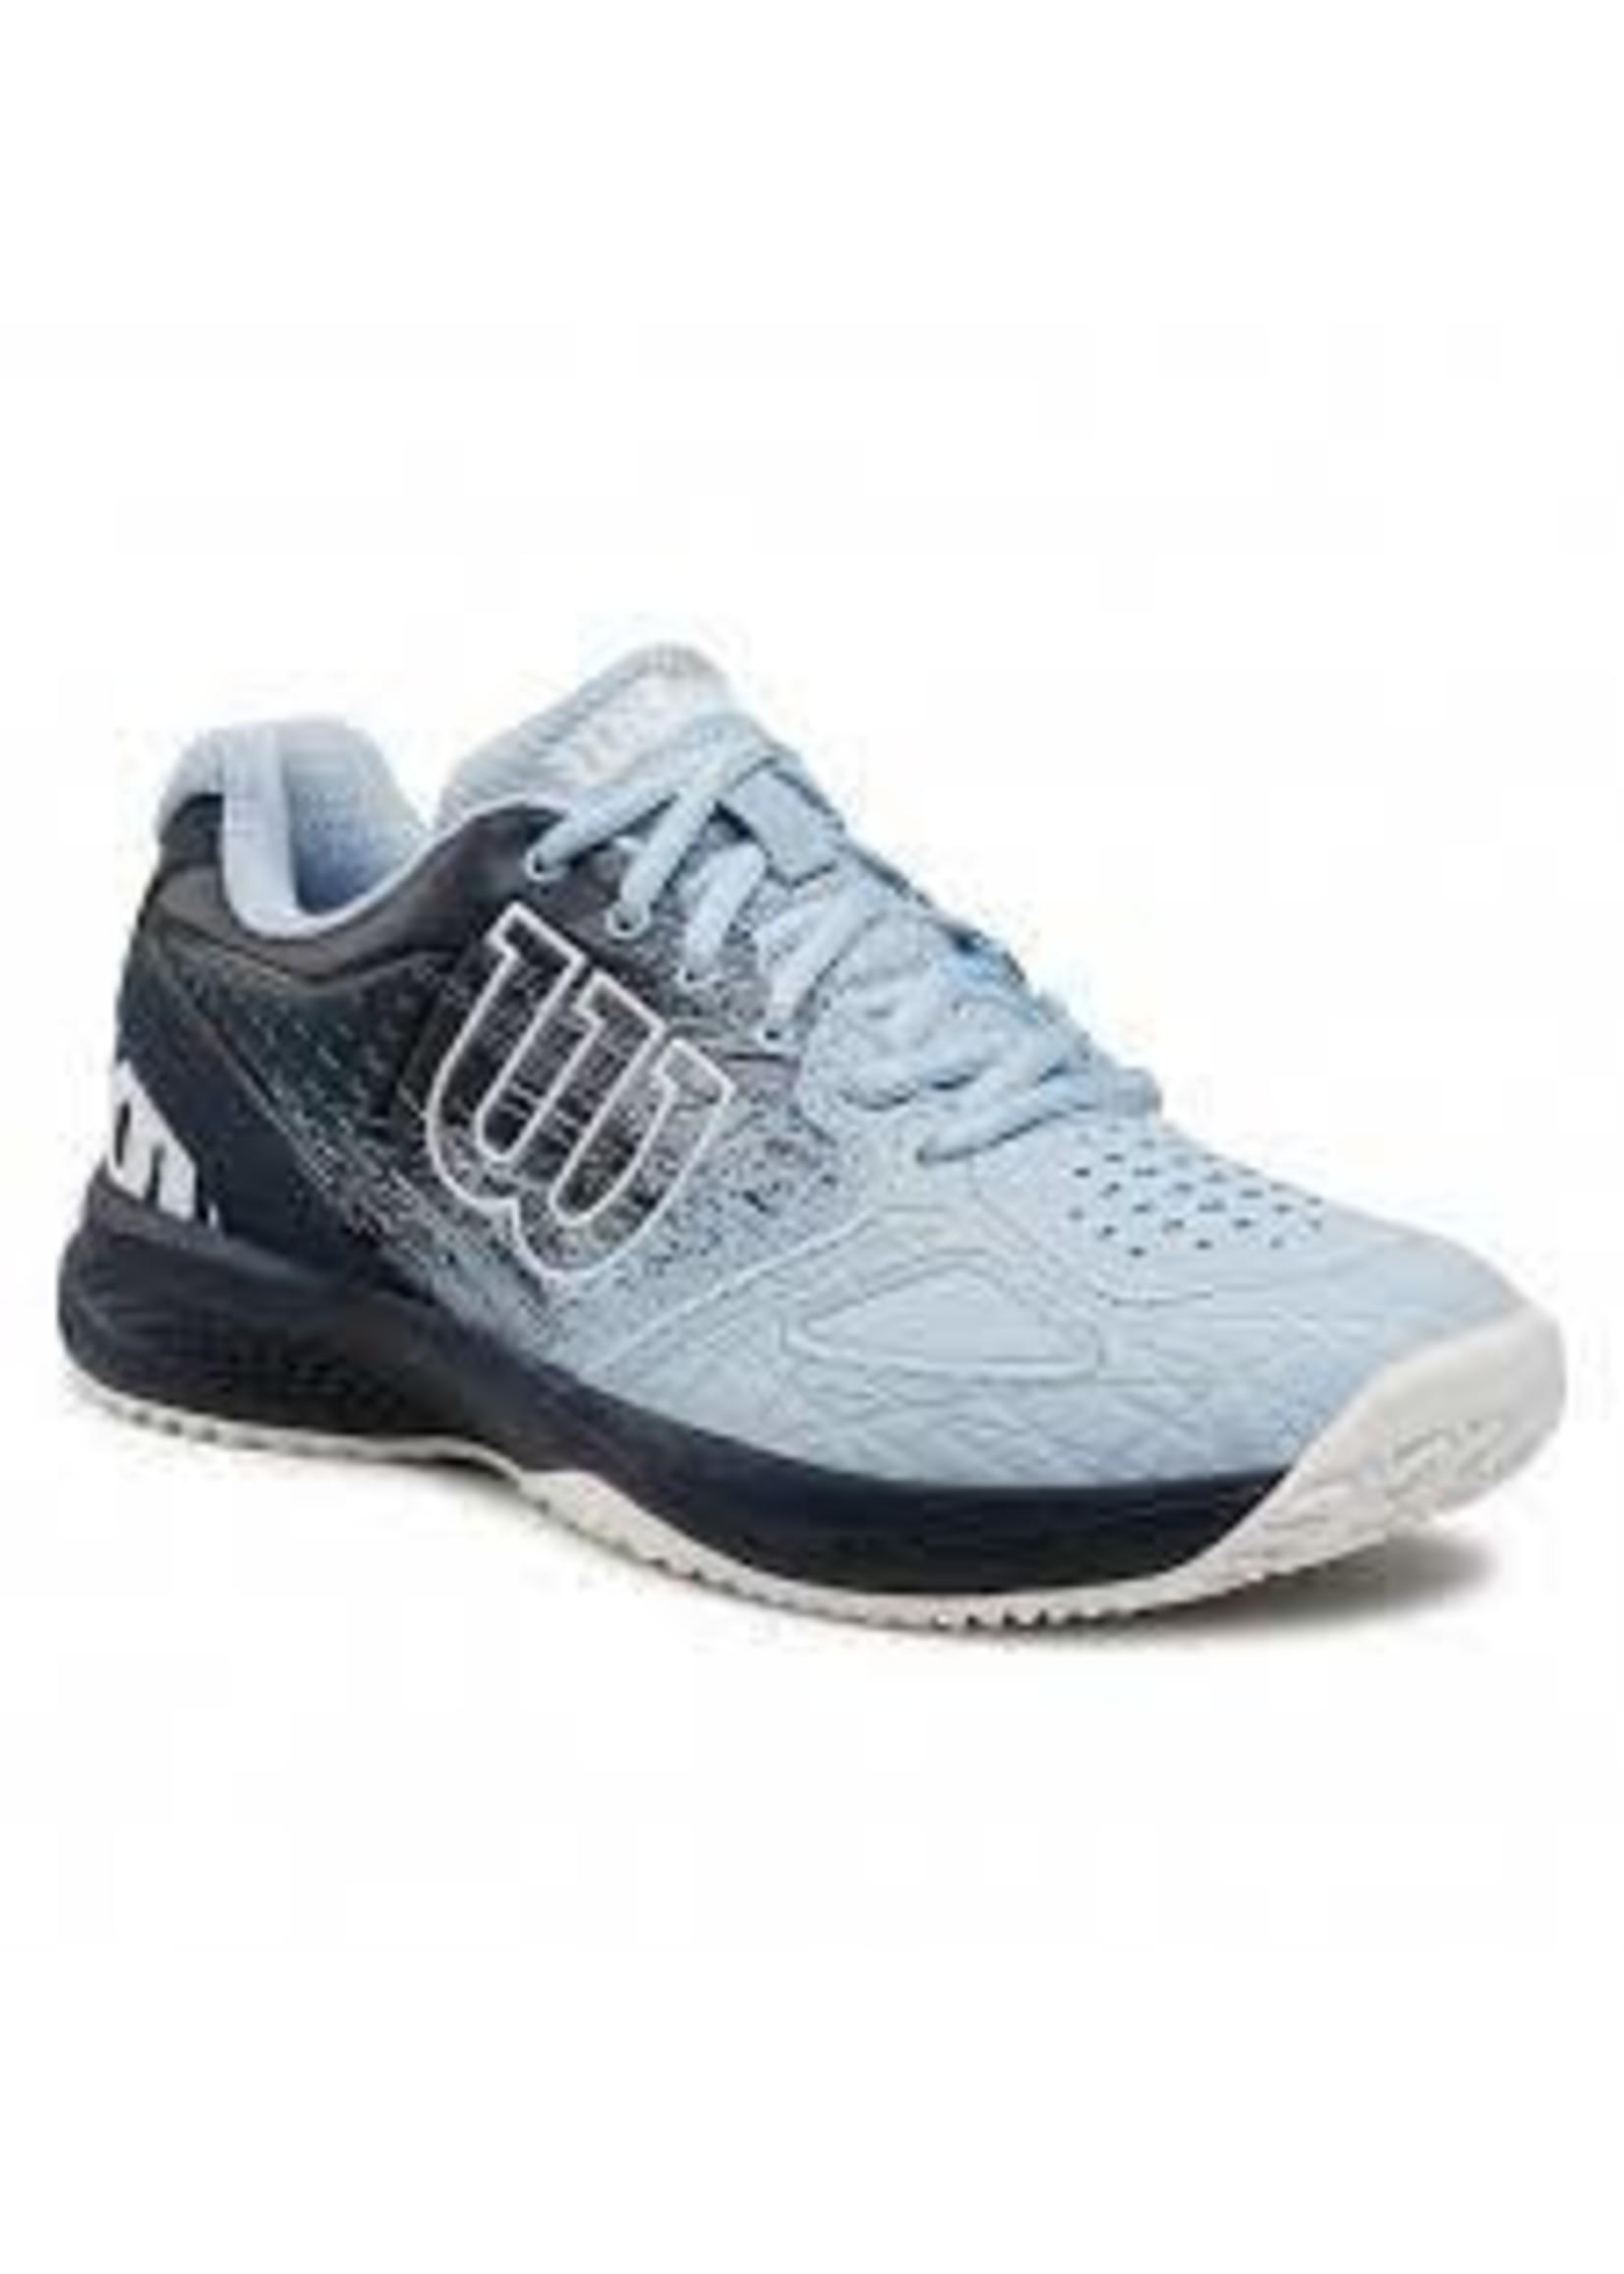 Wilson Wilson Kaos Comp 2.0 Ladies Tennis Shoe (2021)